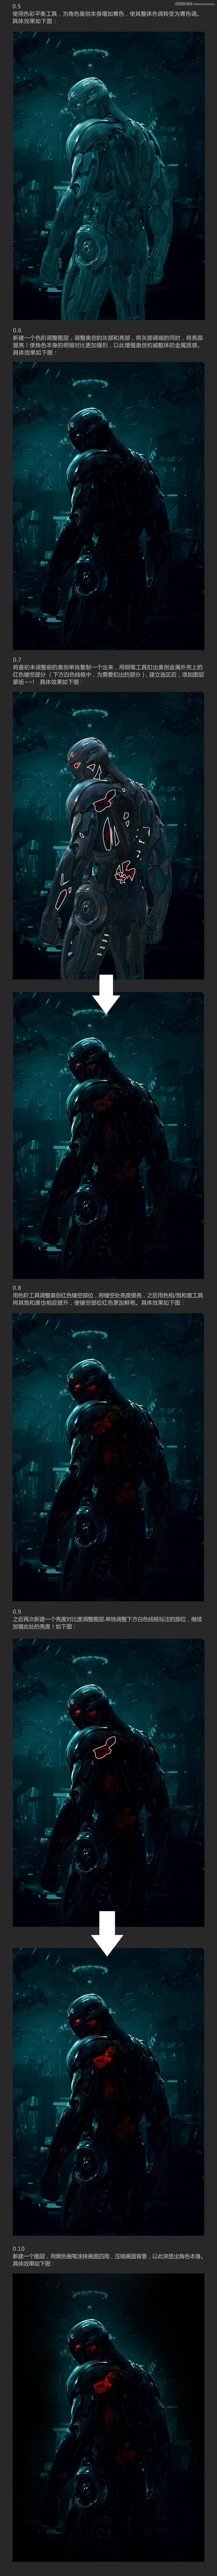 Photoshop合成以奥创为主题的复联电影海报